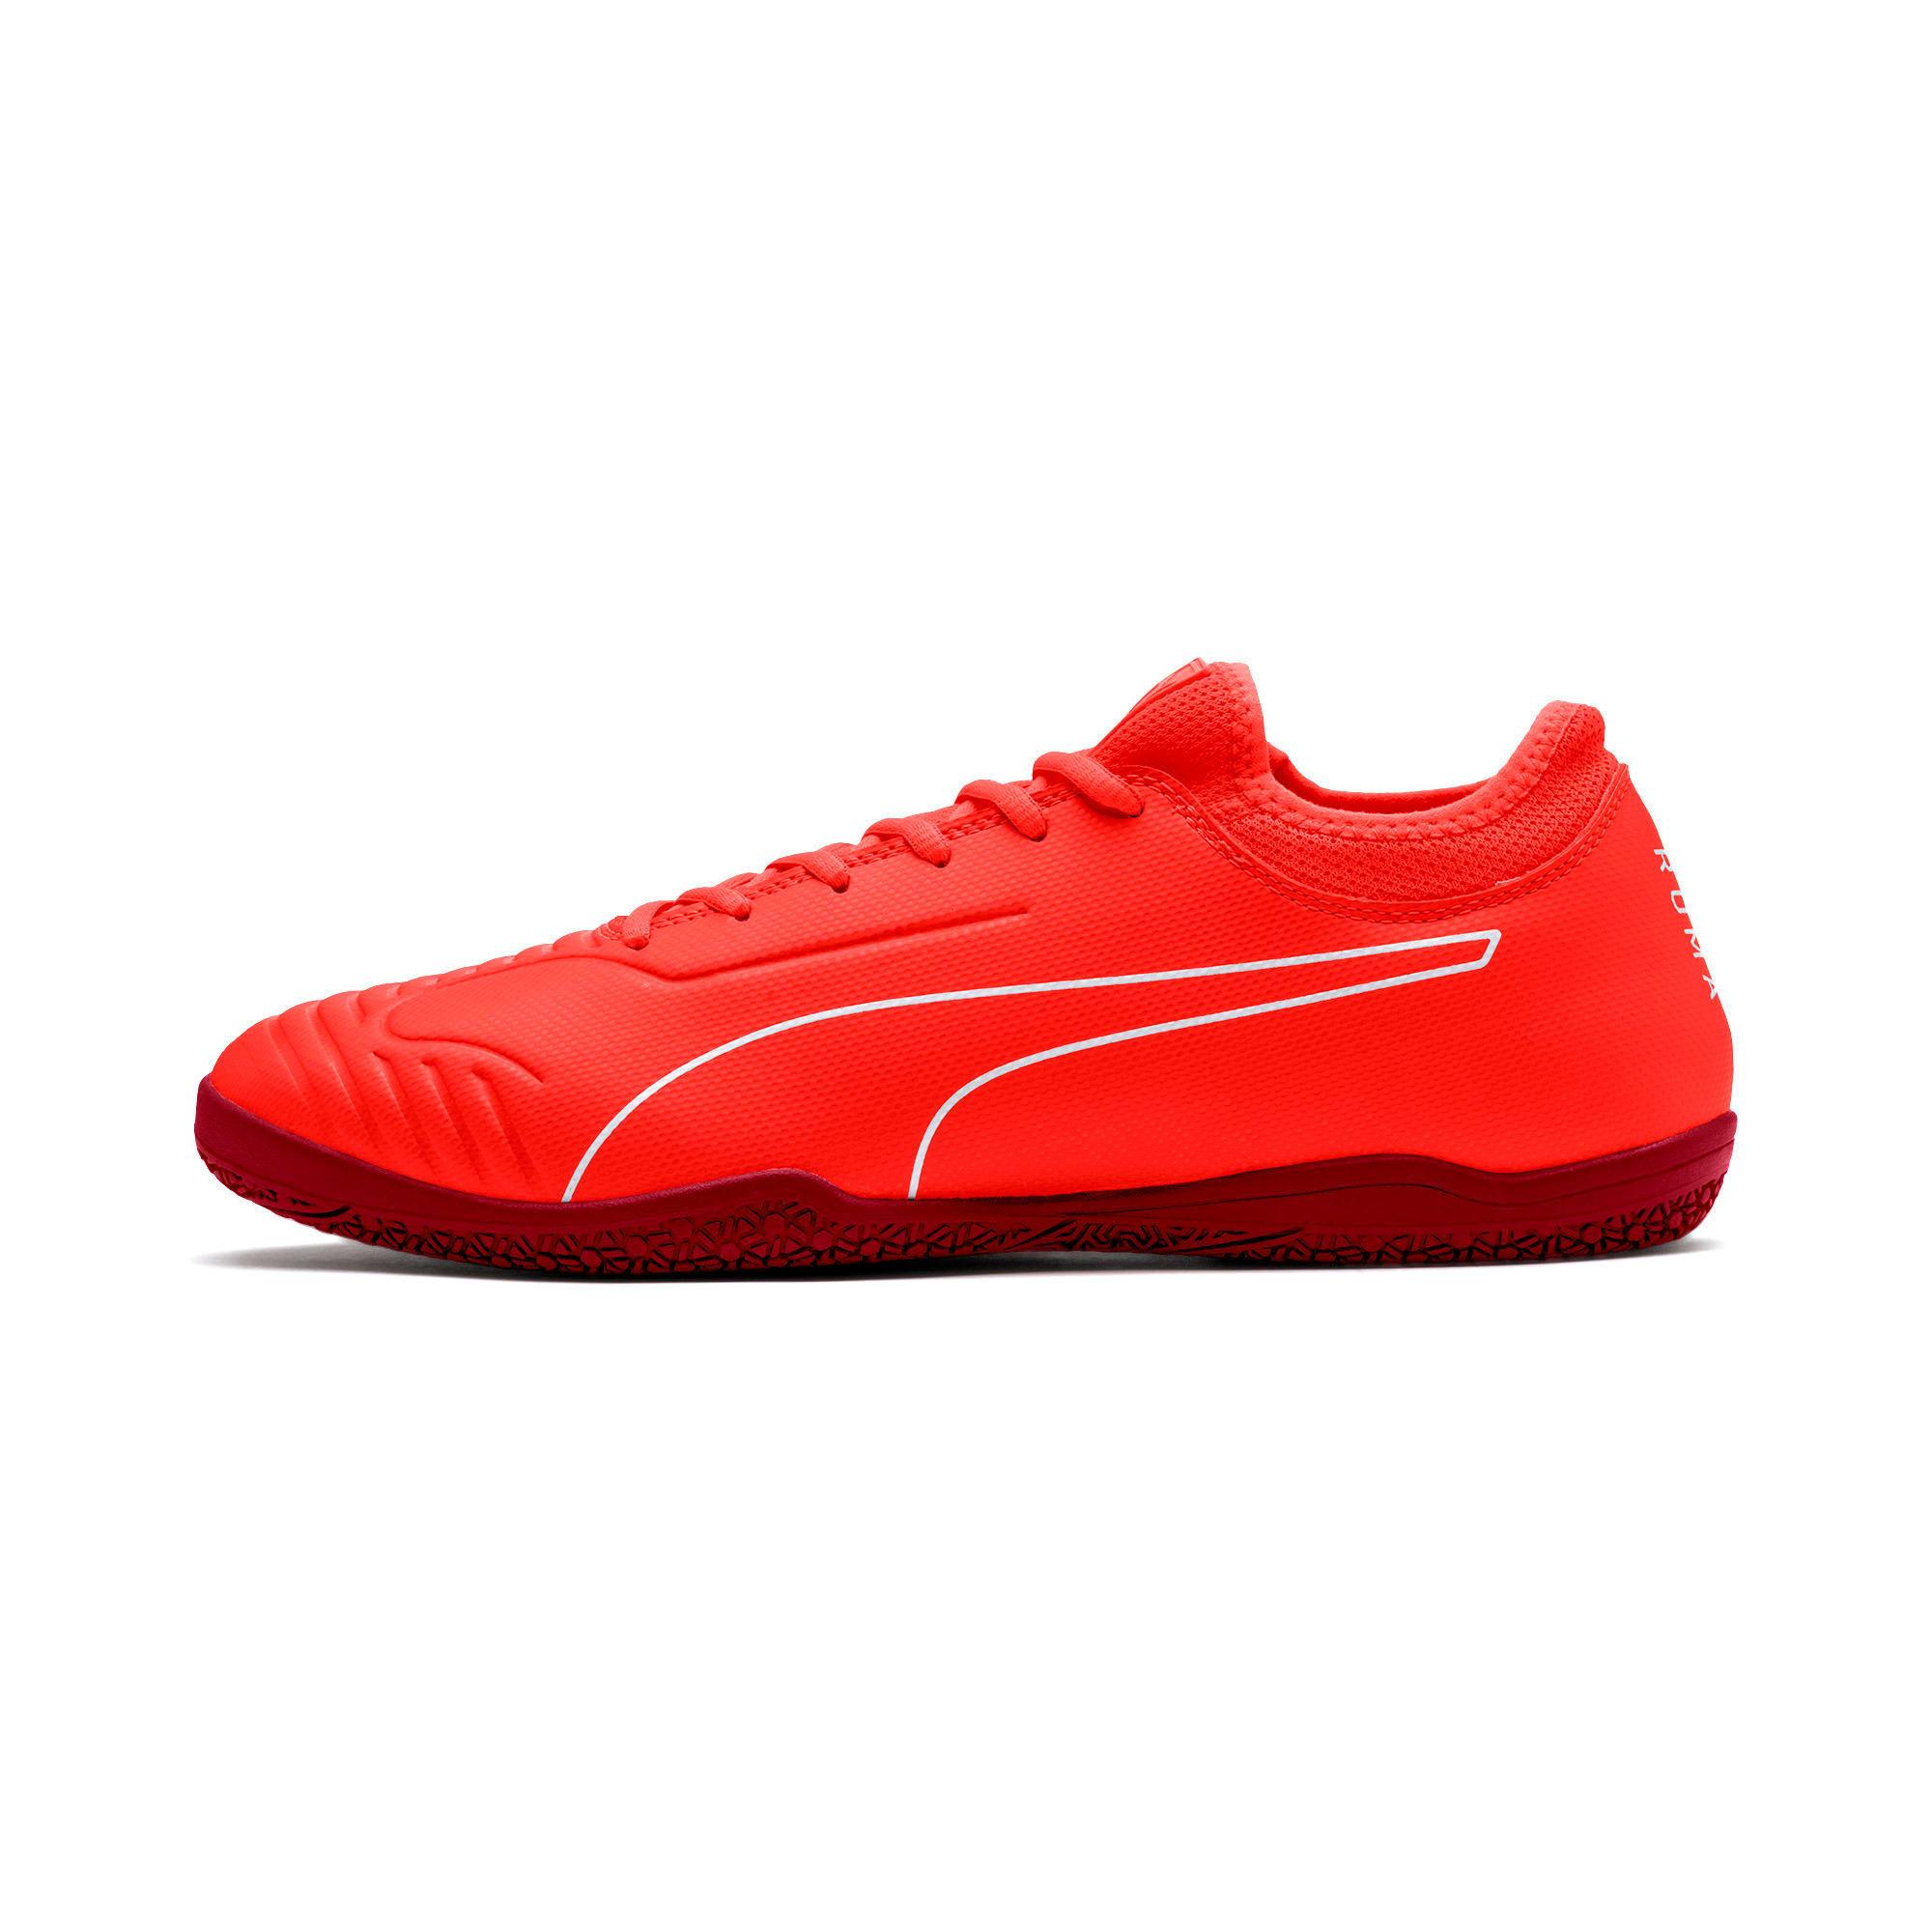 Thumbnail 1 of 365 Sala 2 Men's Soccer Shoes, Nrgy Red-Rhubarb, medium